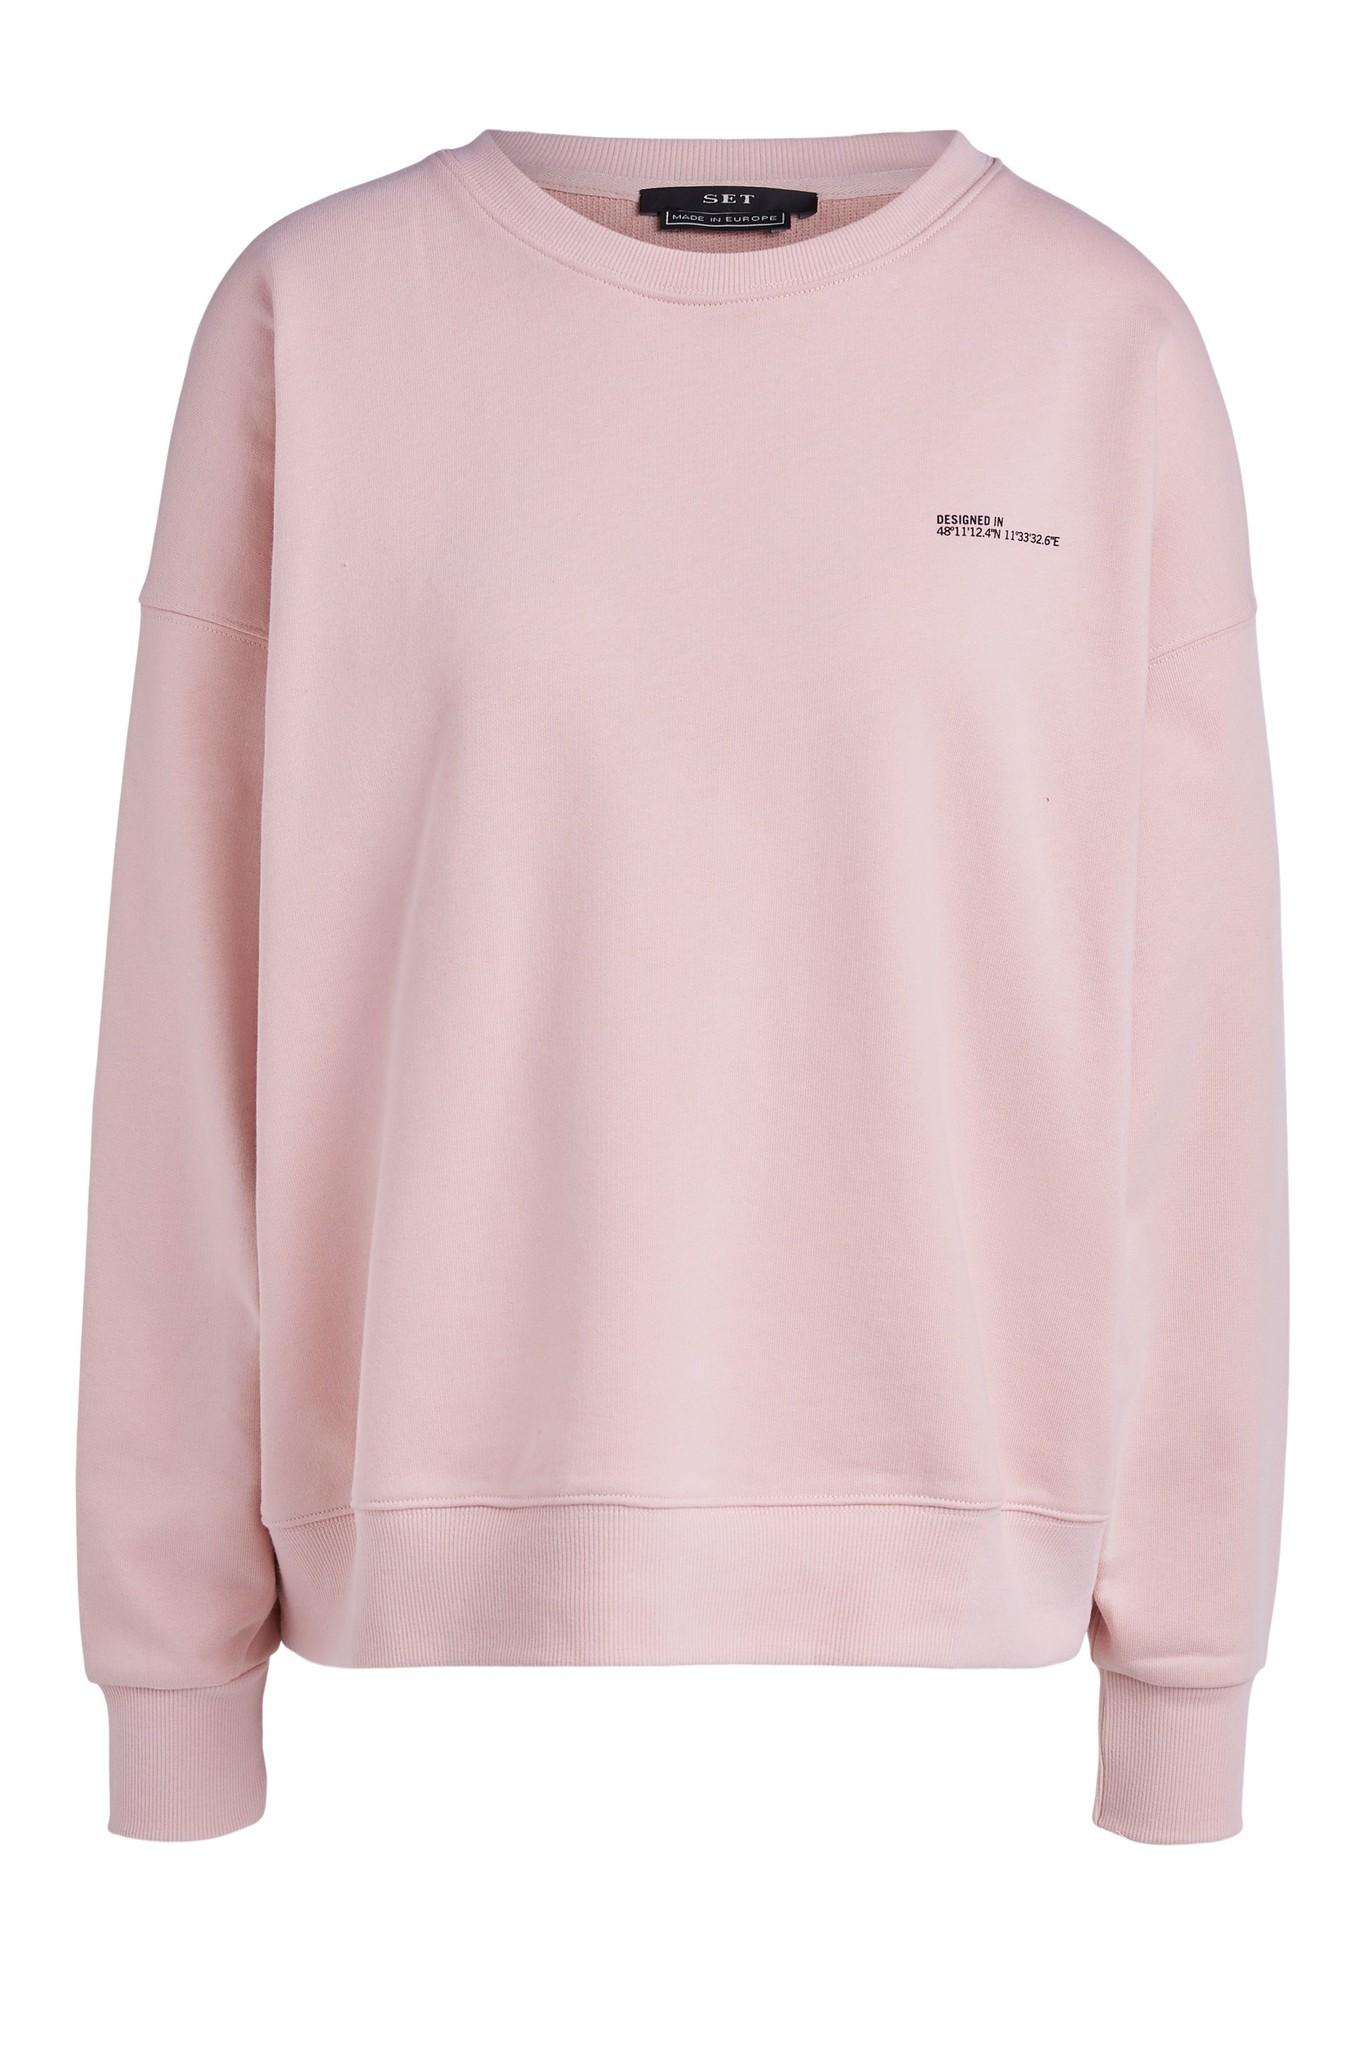 SET sweater 73777 3072-1